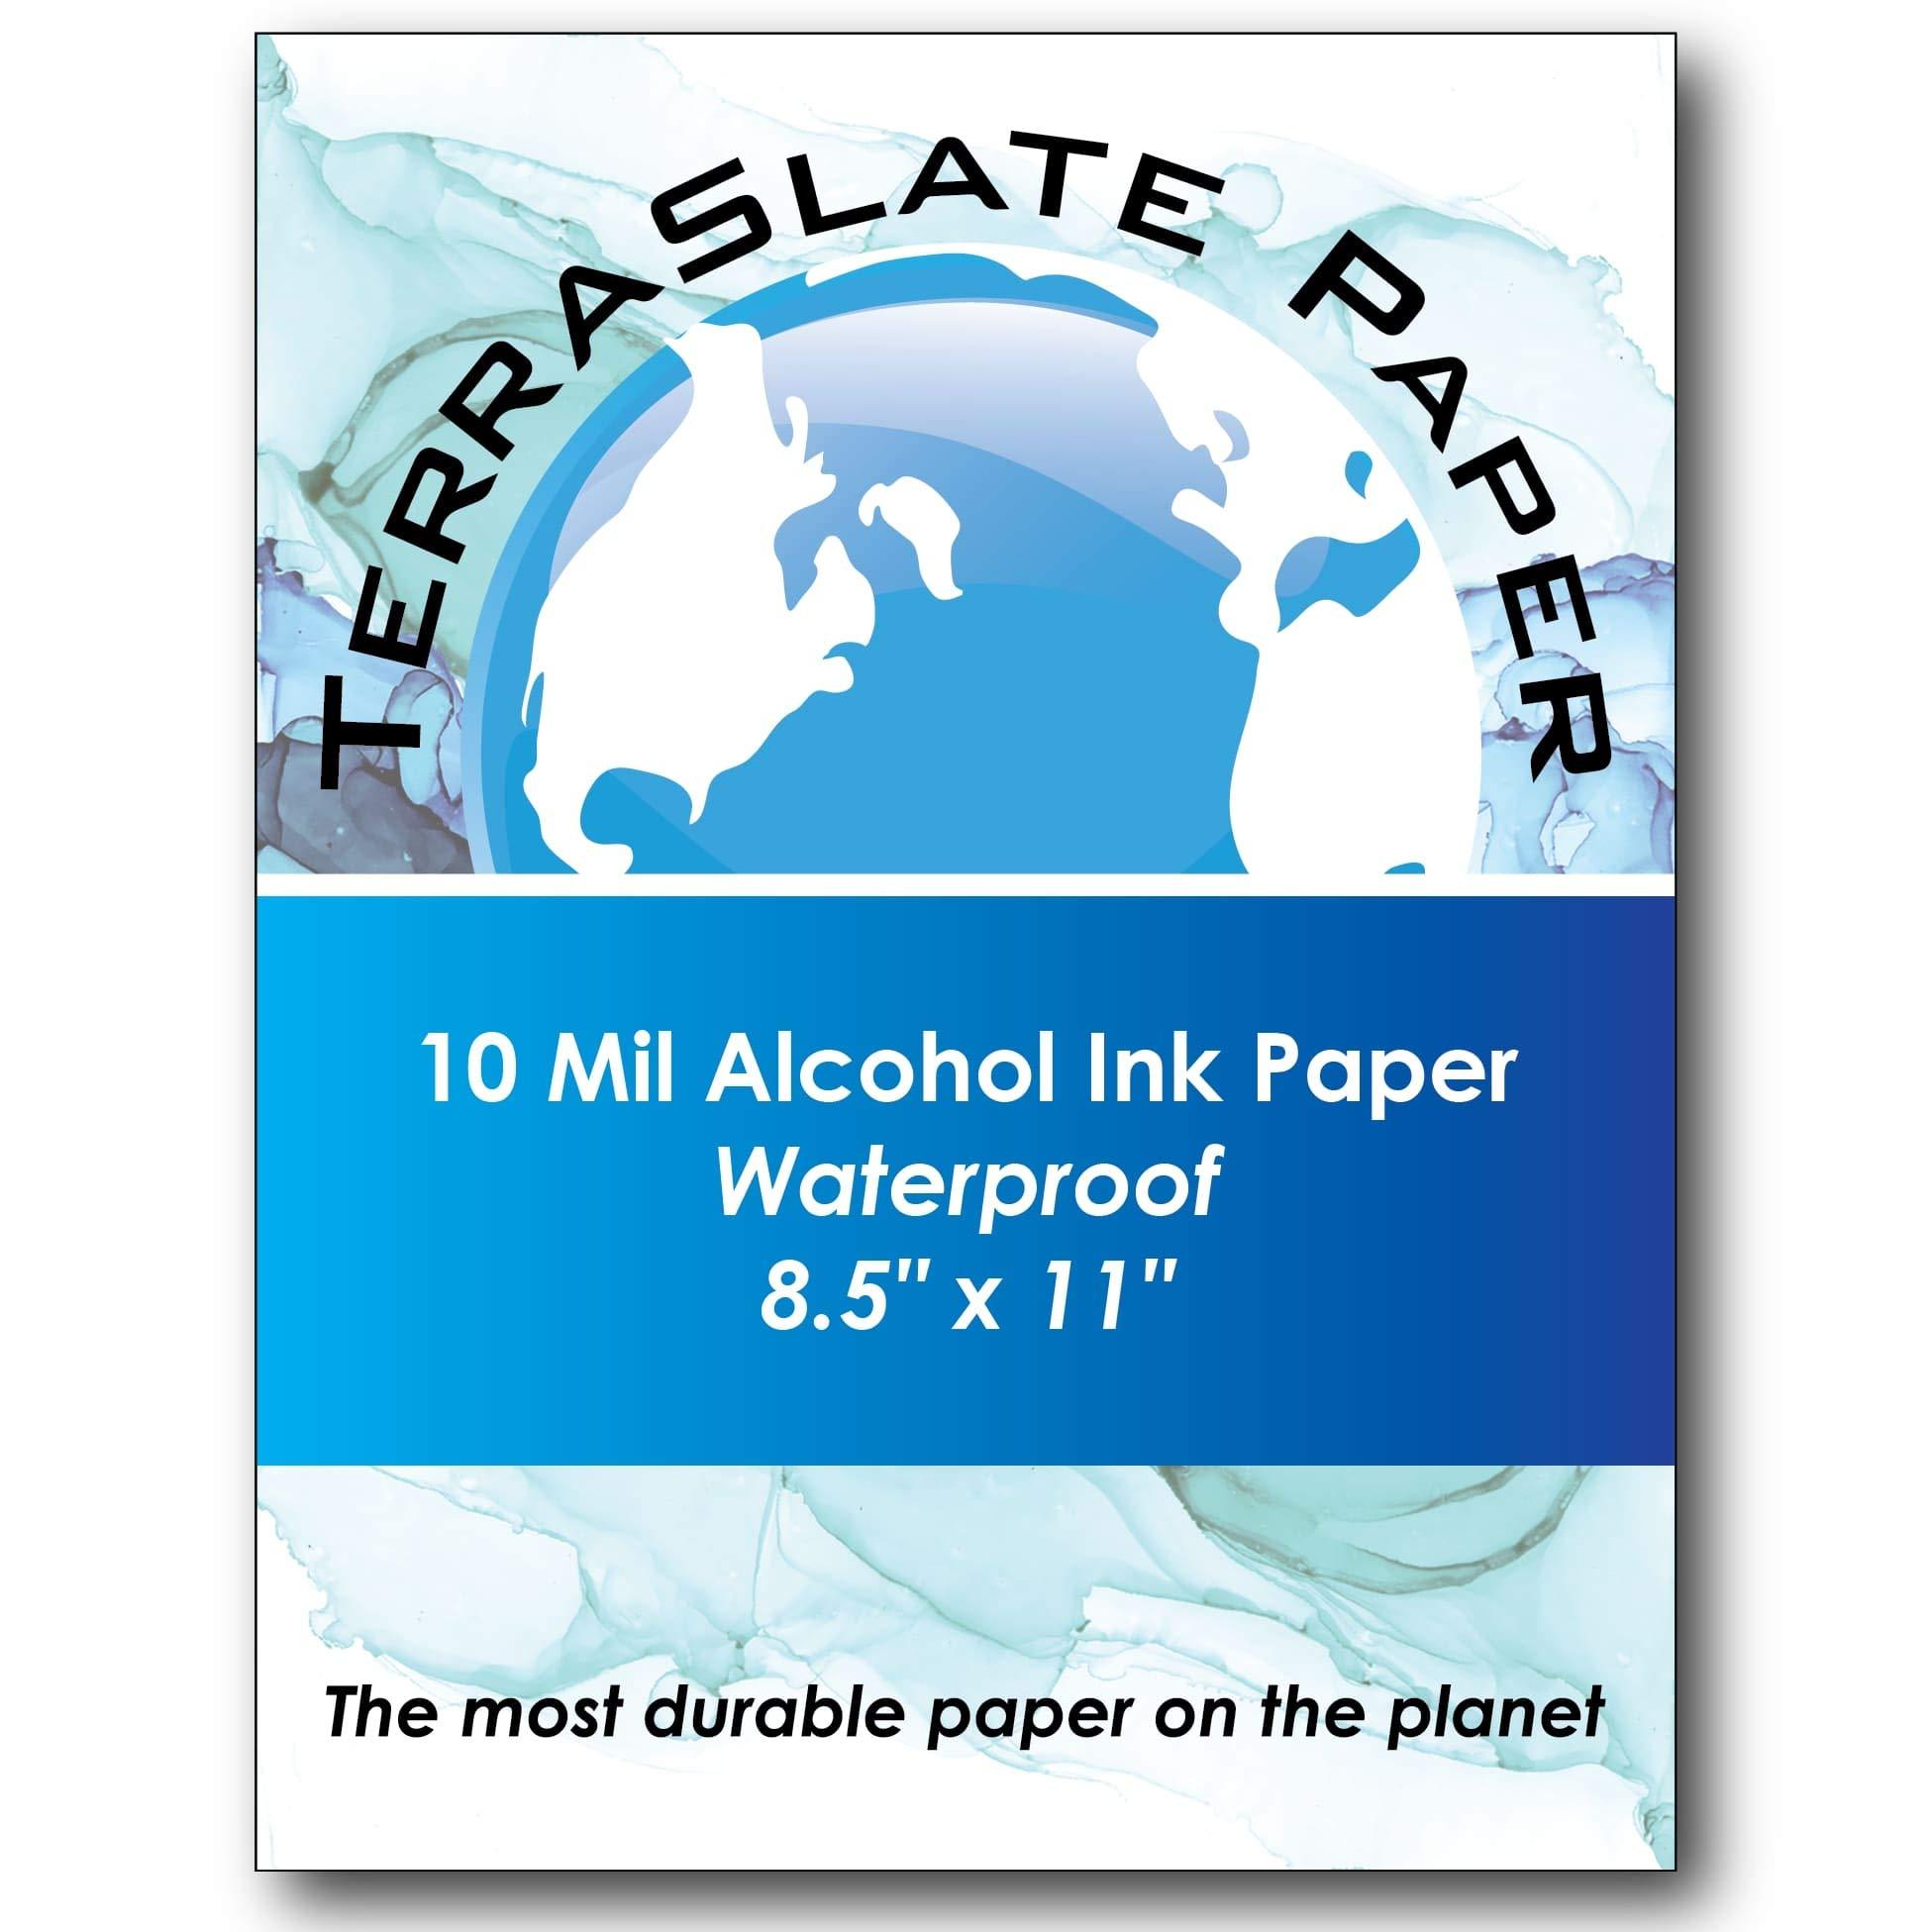 TerraSlate Paper 10 Mil 8.5'' x 11'' Alcohol Ink Art Paper 25 Sheets by TerraSlate